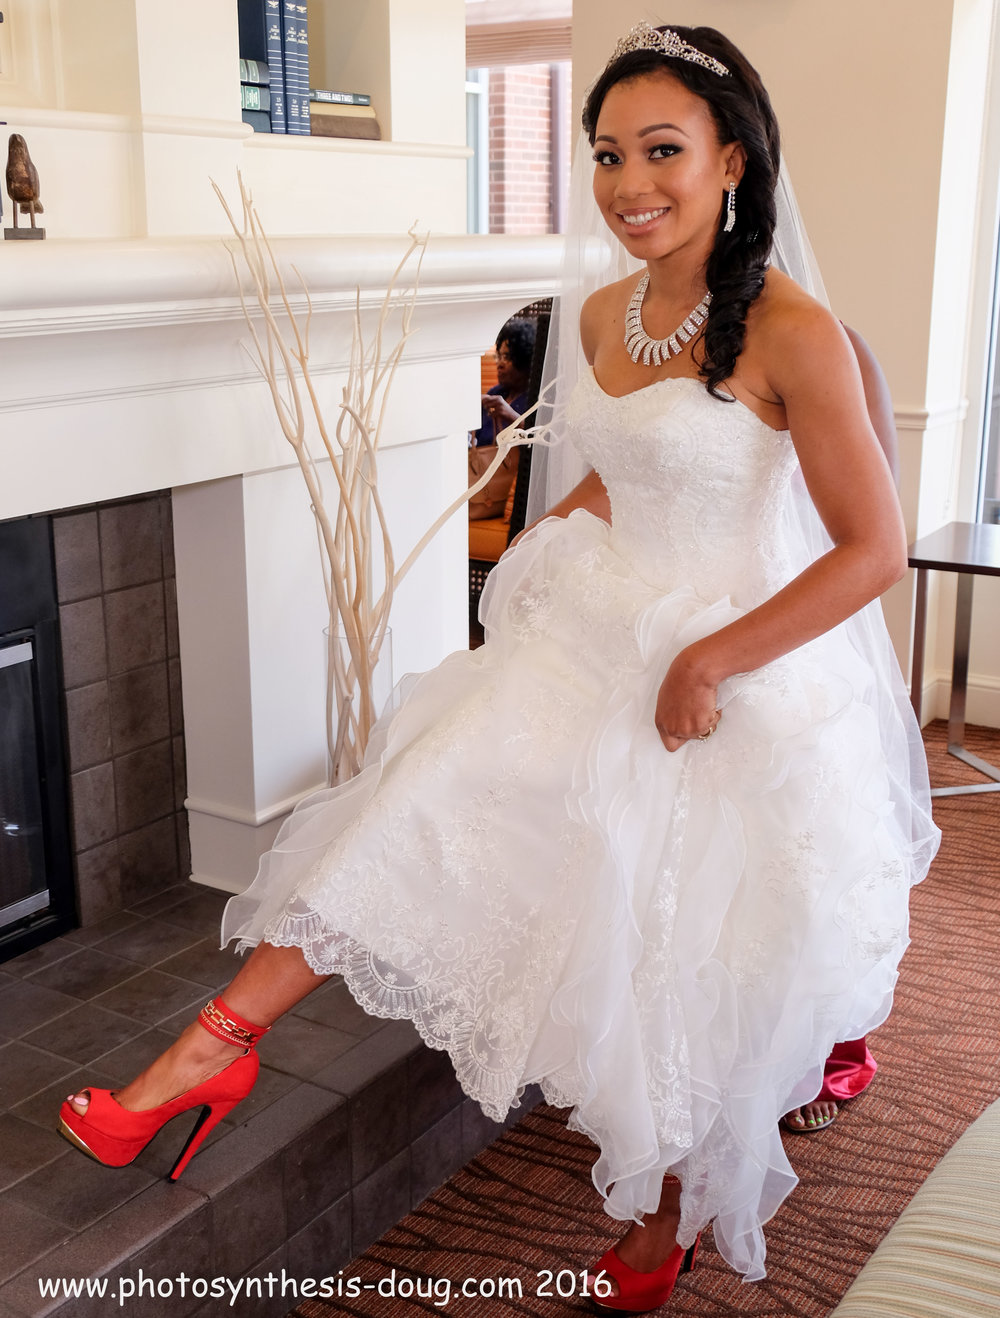 Brides by Doug-7225.jpg